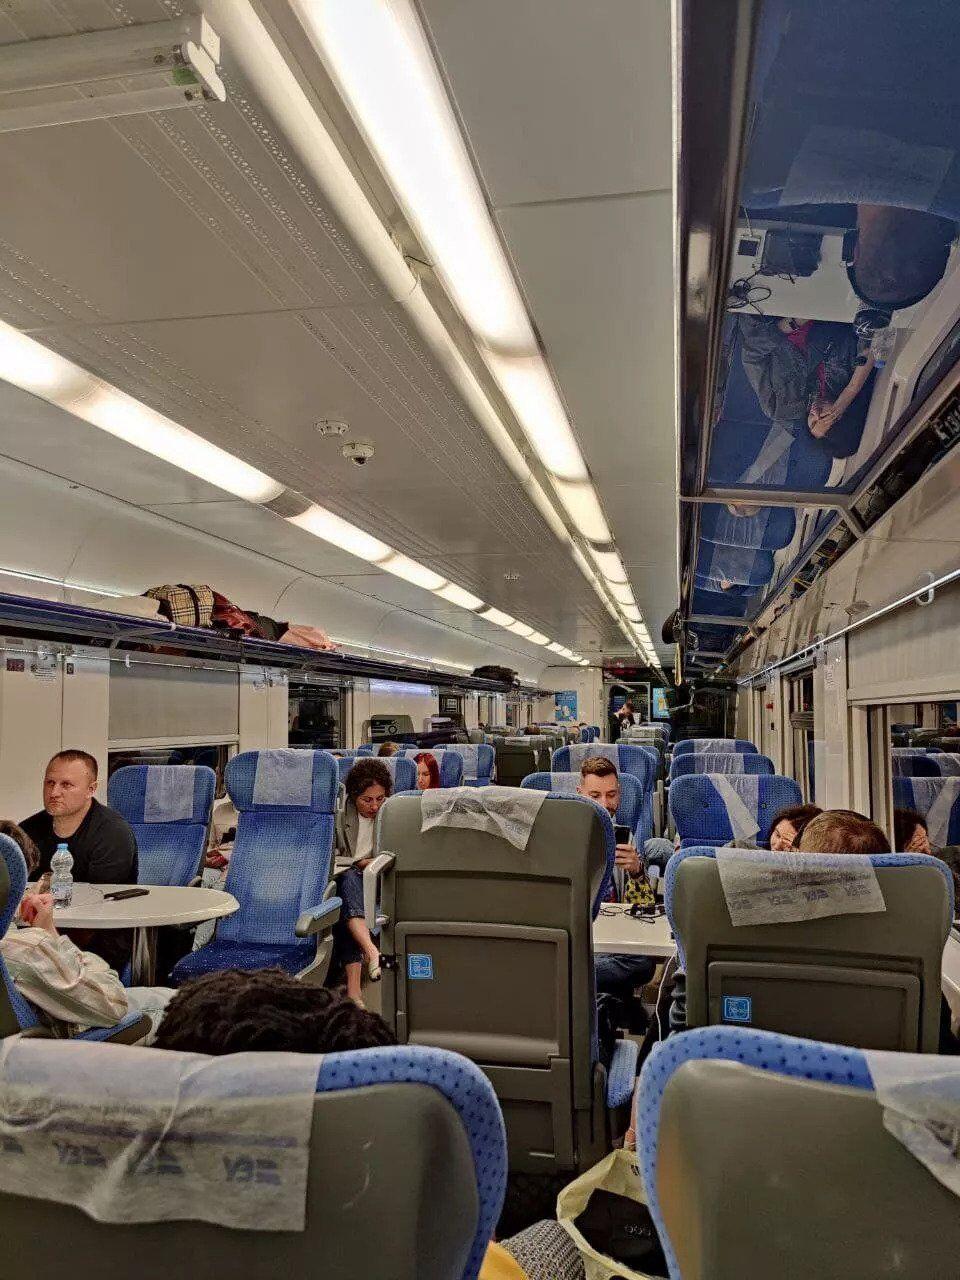 Кадры из вагона поезда